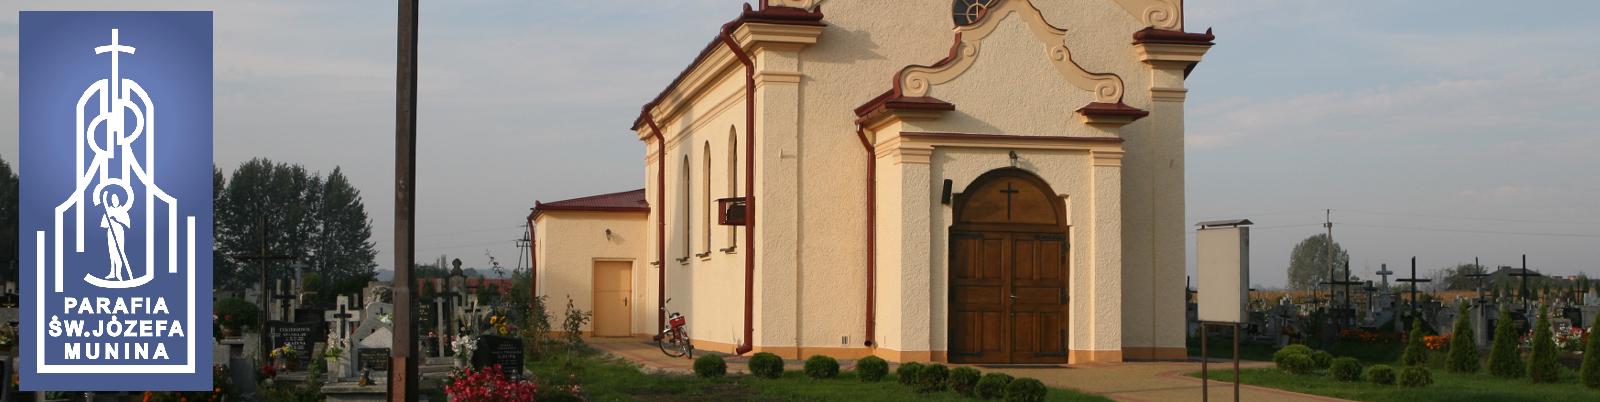 Parafia Munina